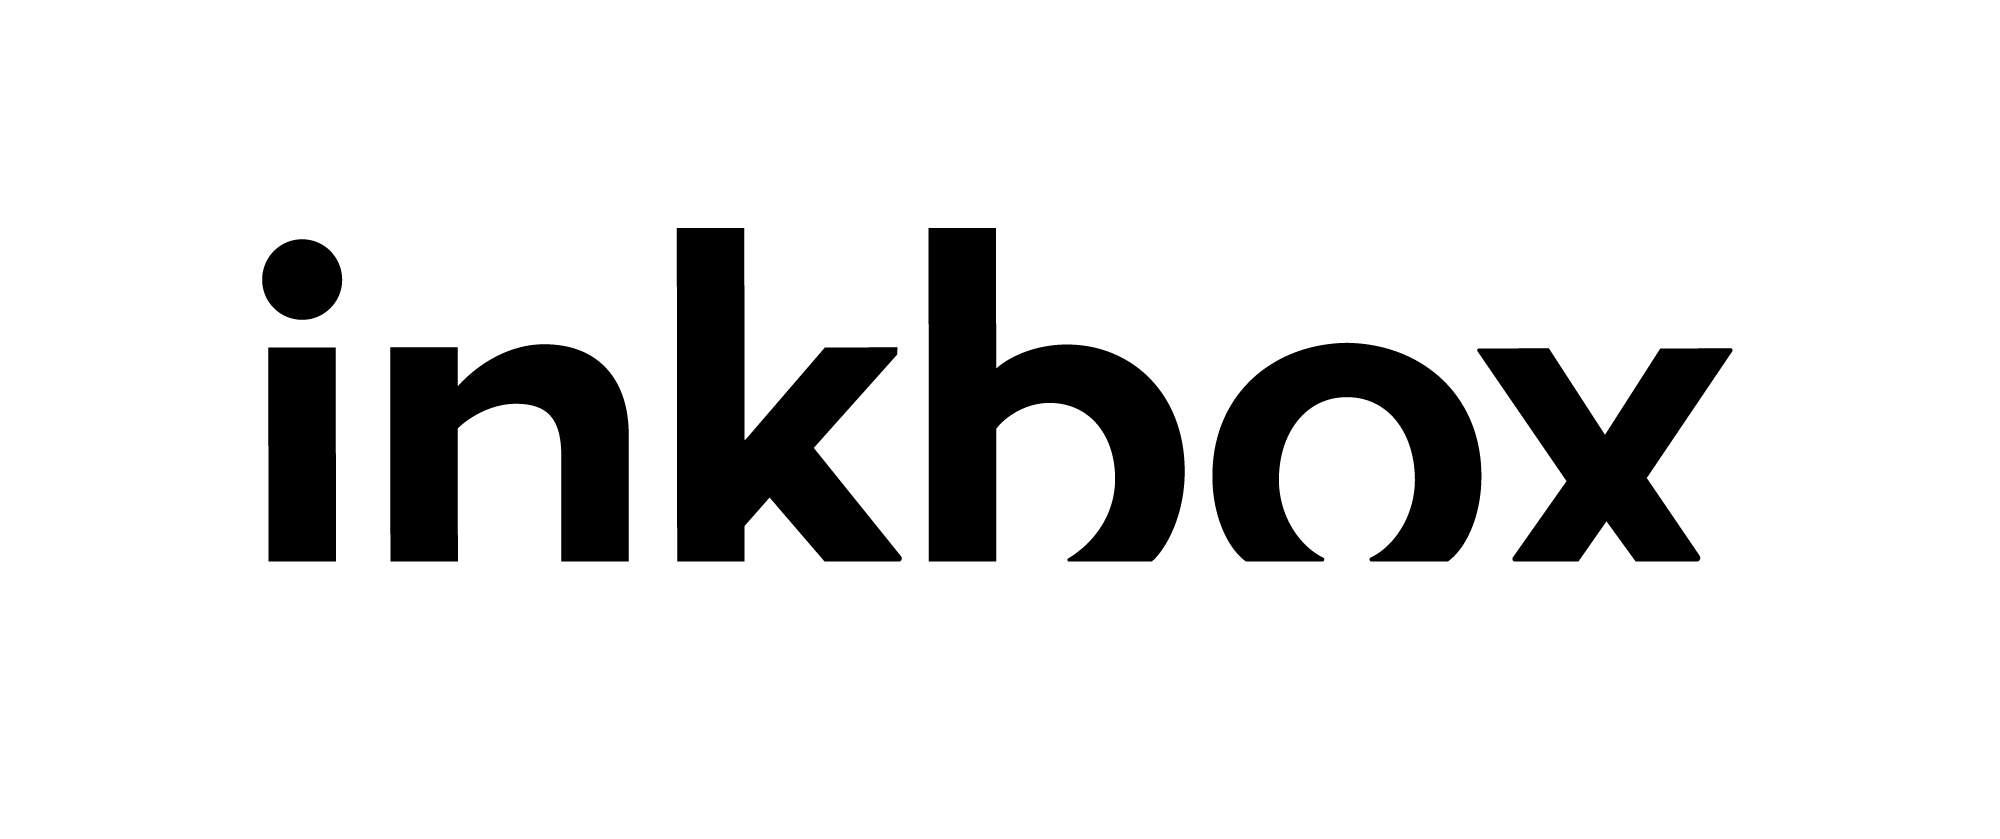 inkbox_logo_black_2000px.png